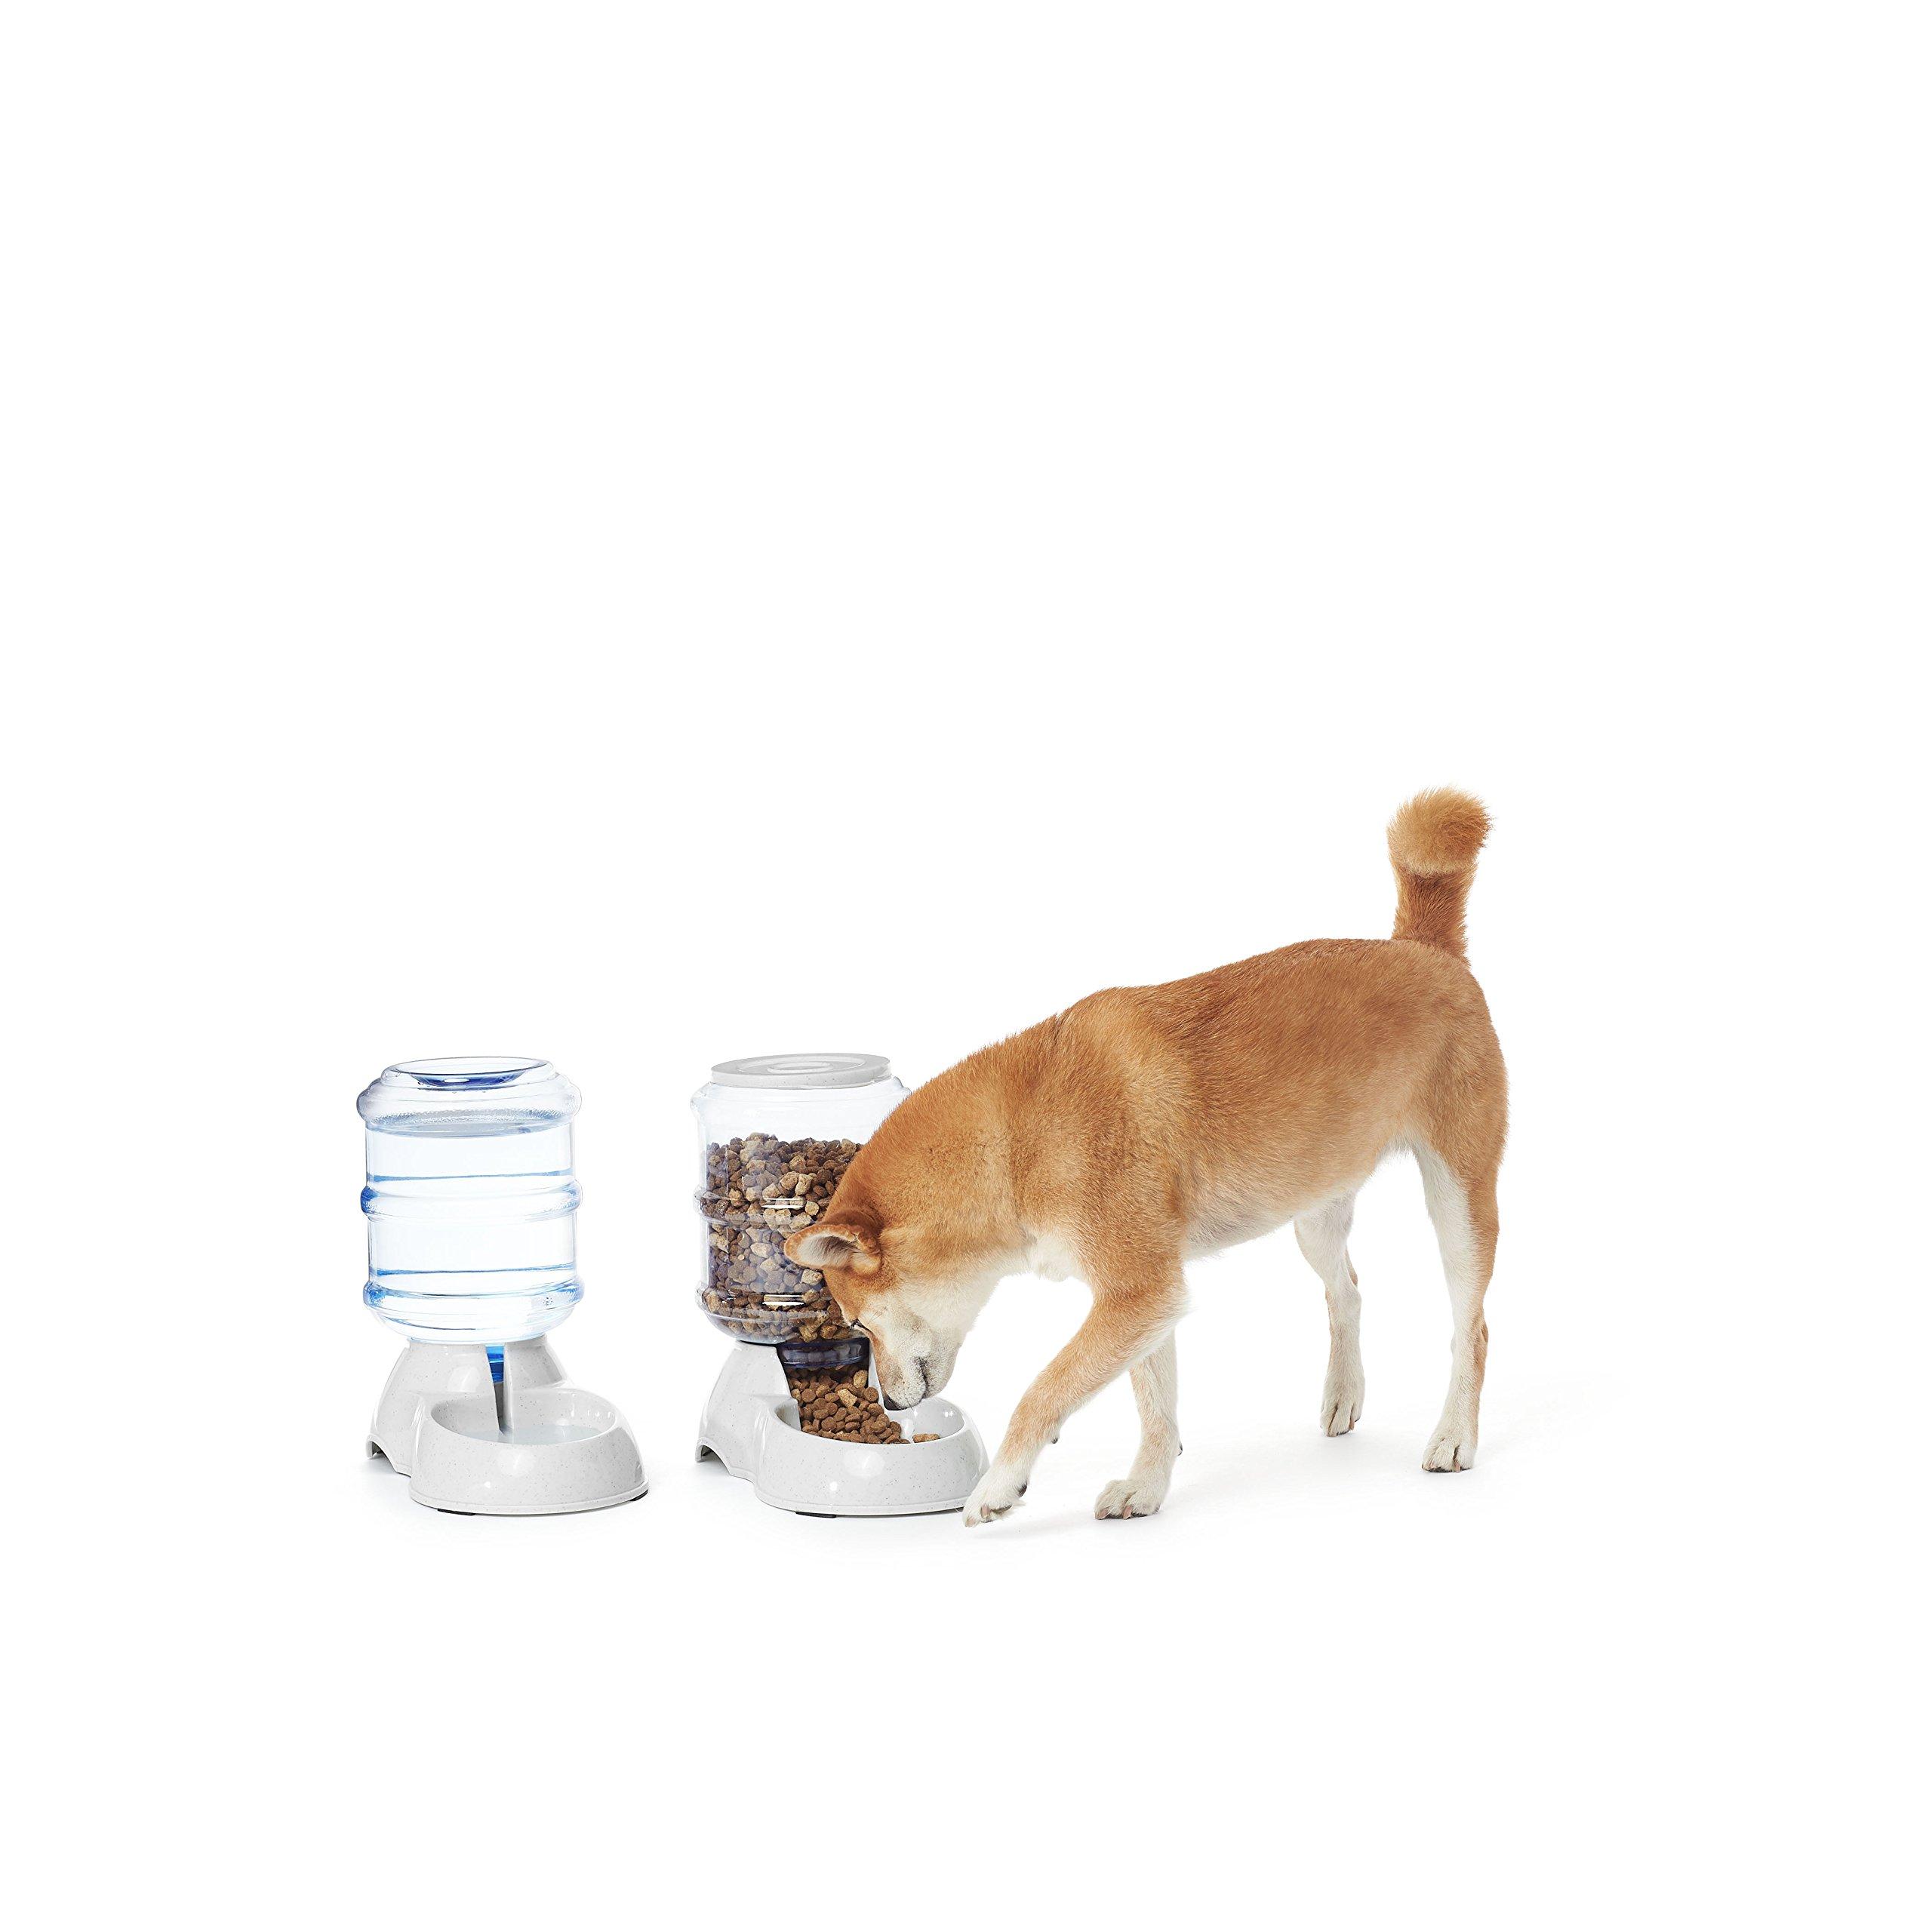 AmazonBasics Gravity Pet Feeder and Waterer Bundle, Small